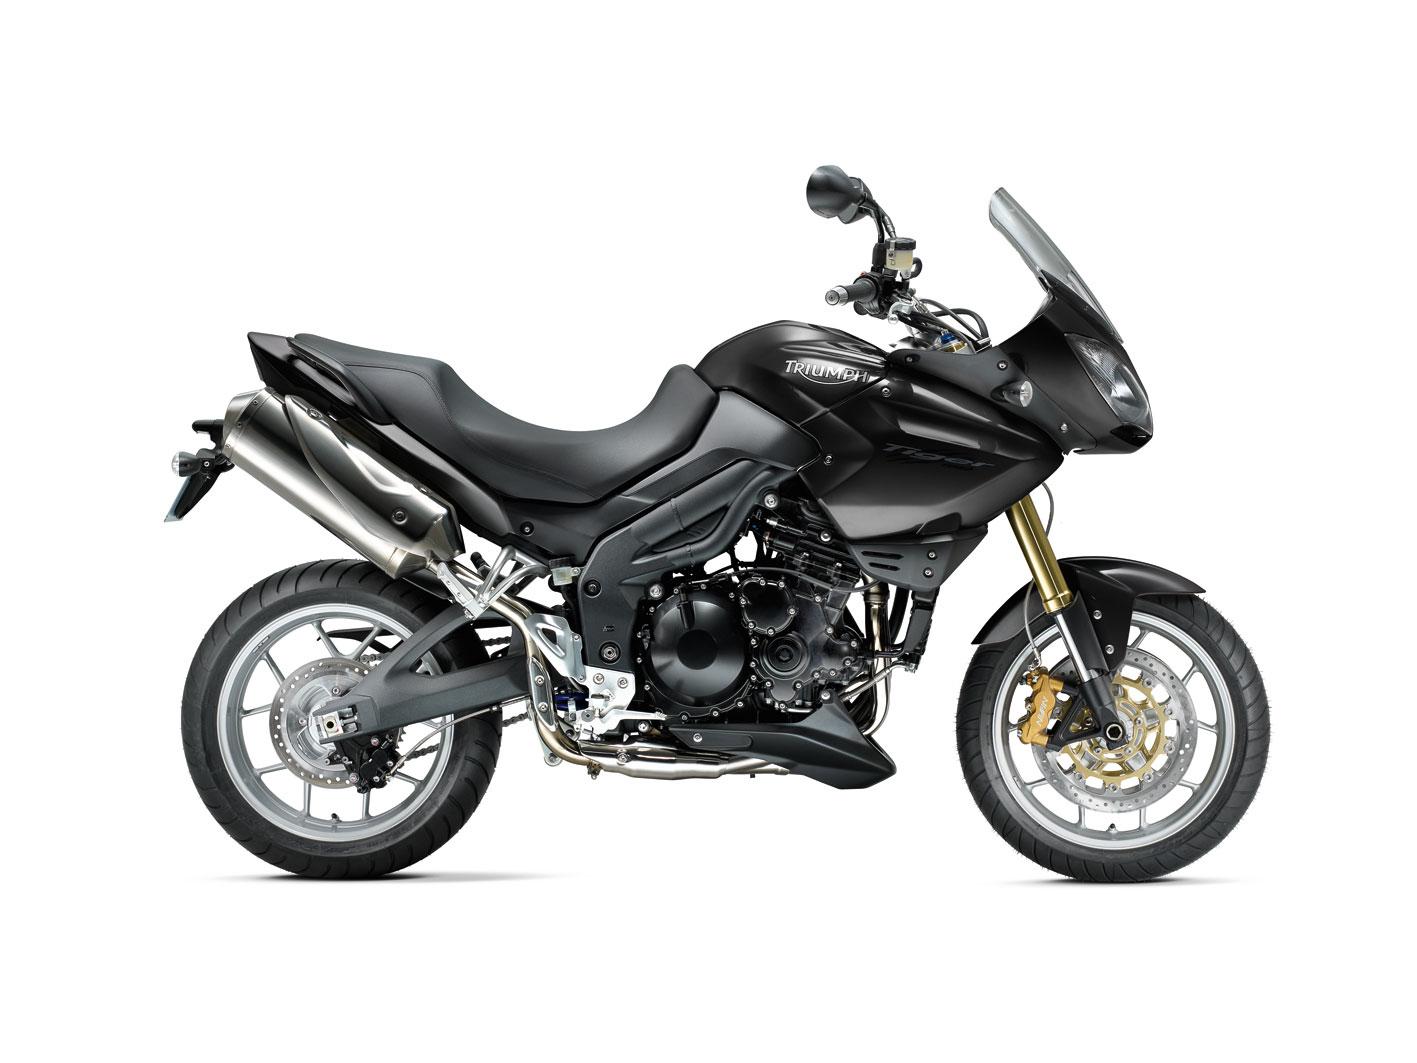 motorcycle pictures triumph tiger 1050 2011. Black Bedroom Furniture Sets. Home Design Ideas